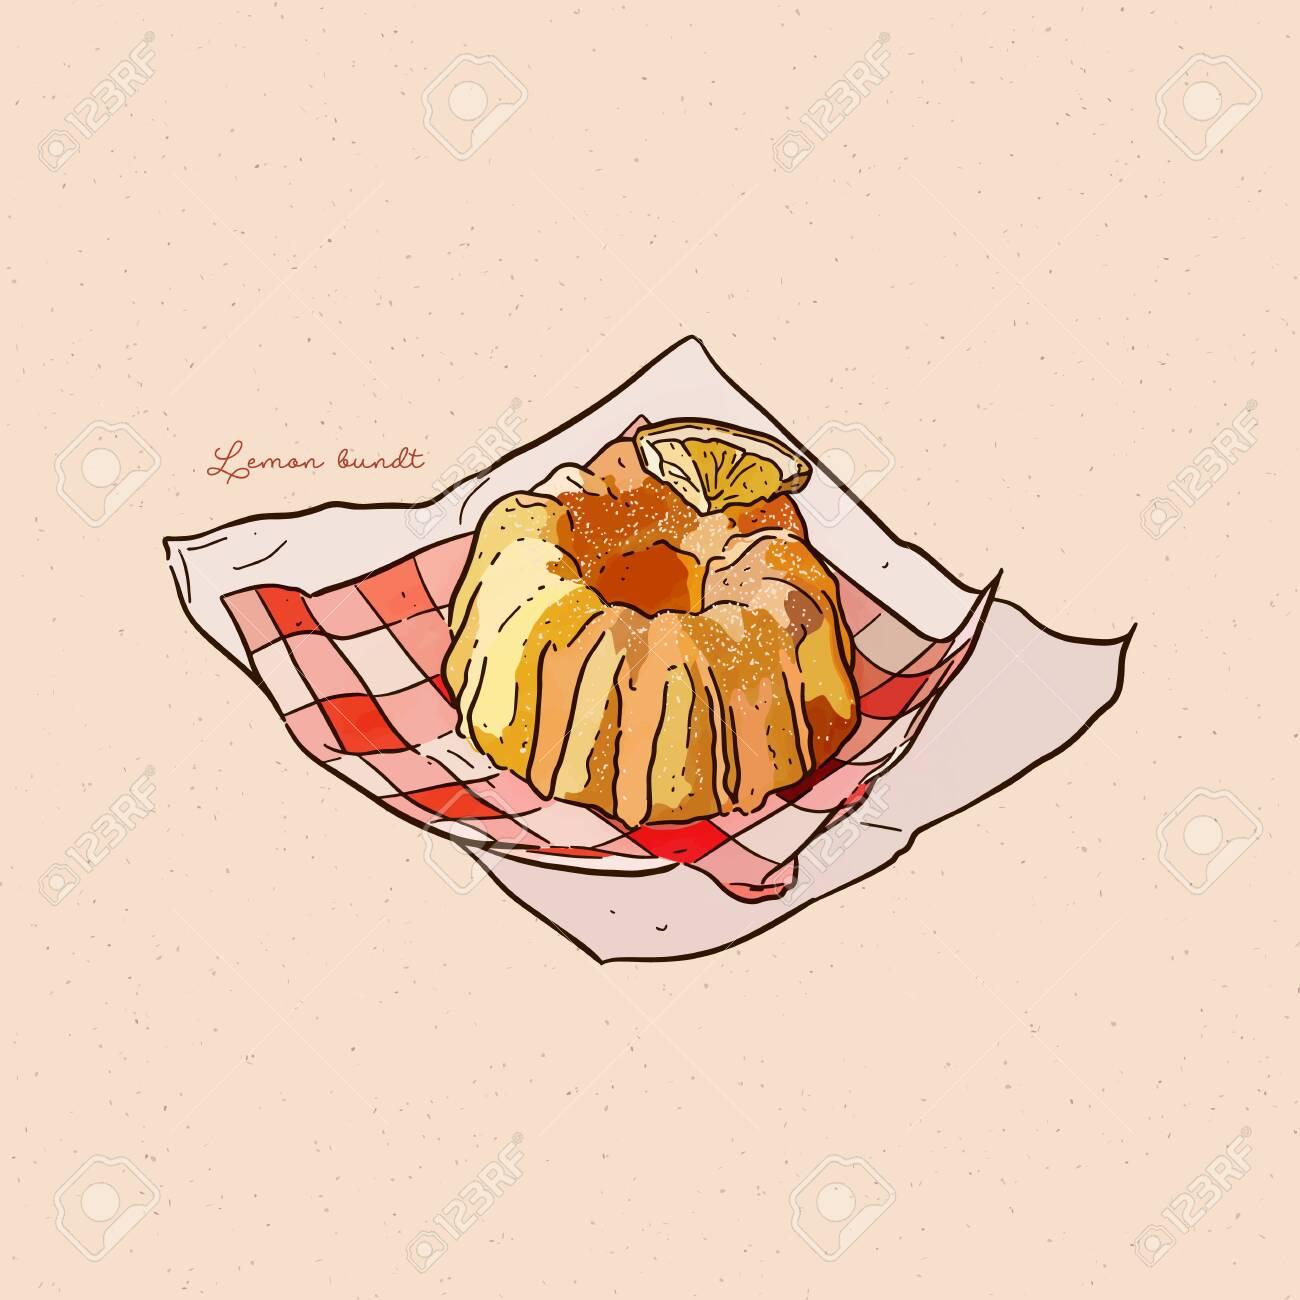 Lemon bundt cake, hand draw sketch vector. - 148151023